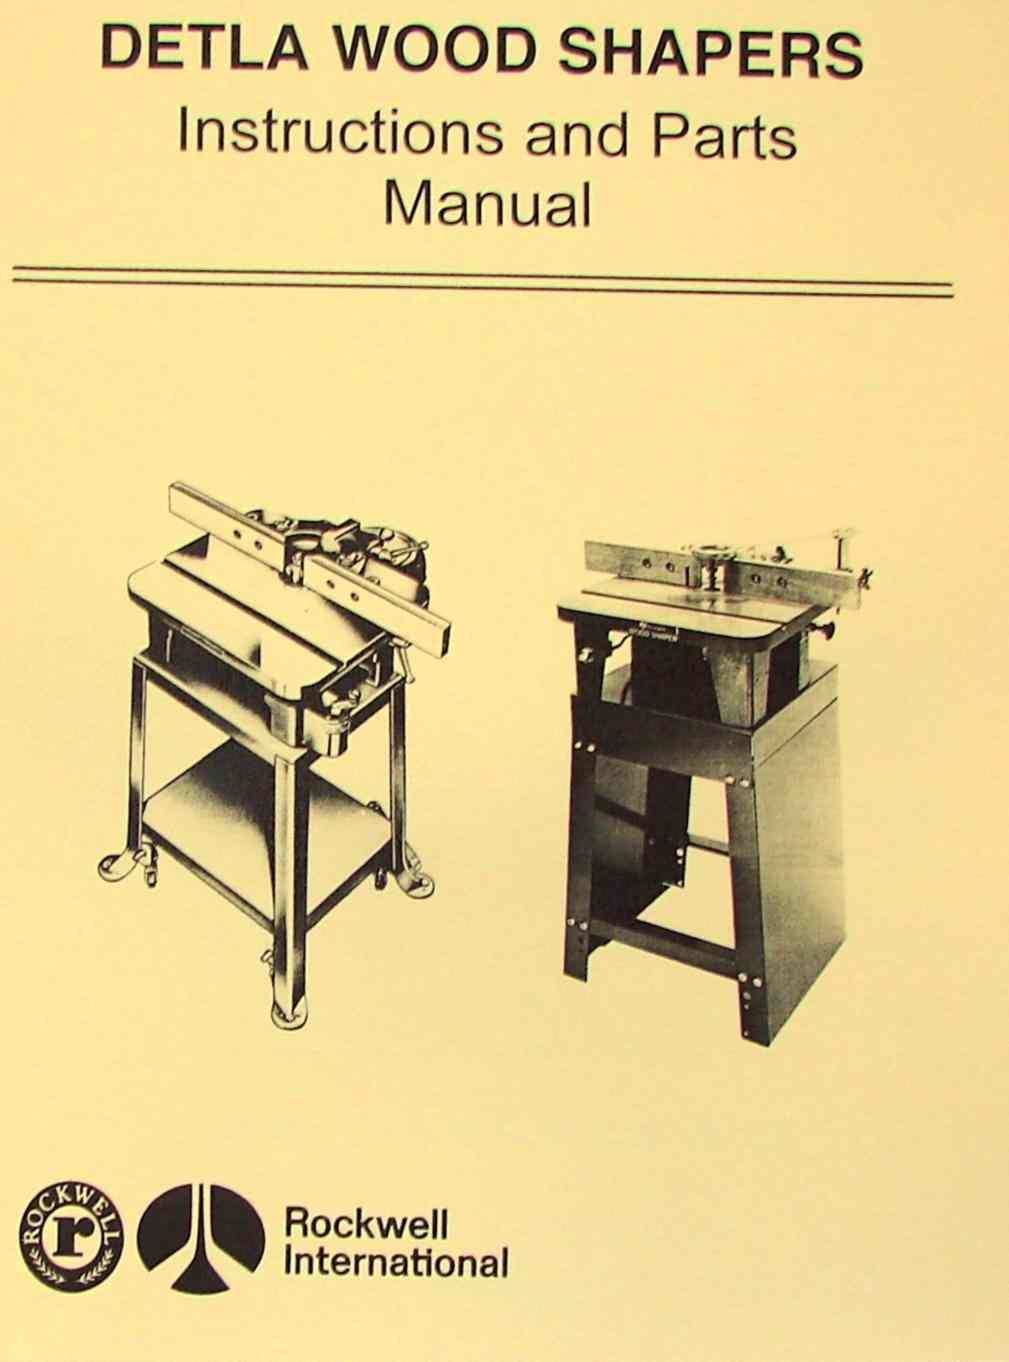 Rockwell Delta Homecraft Wood Shapers Operating Parts Manual Piano Diagram Ozark Tool Manuals Books